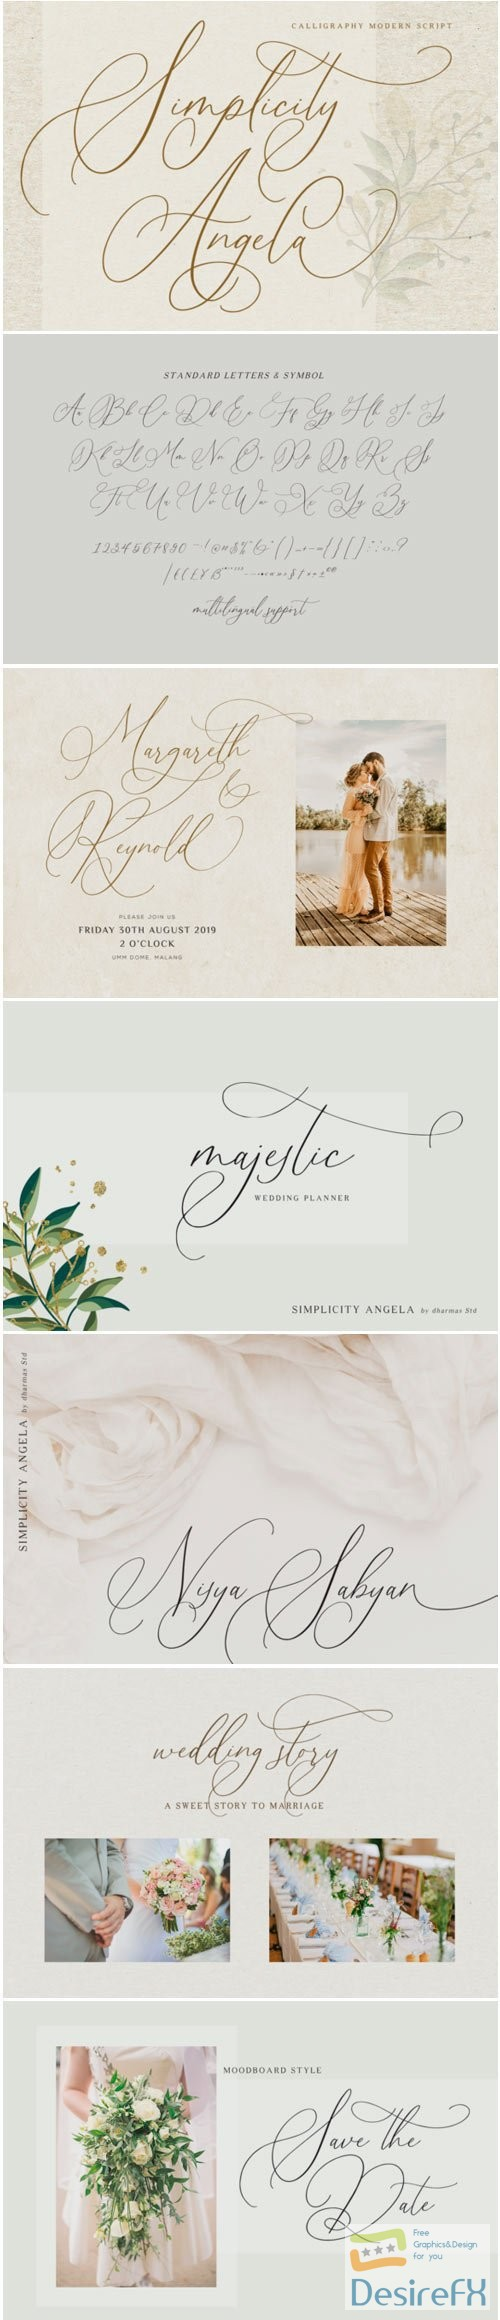 fonts - Simplicity Angela Font